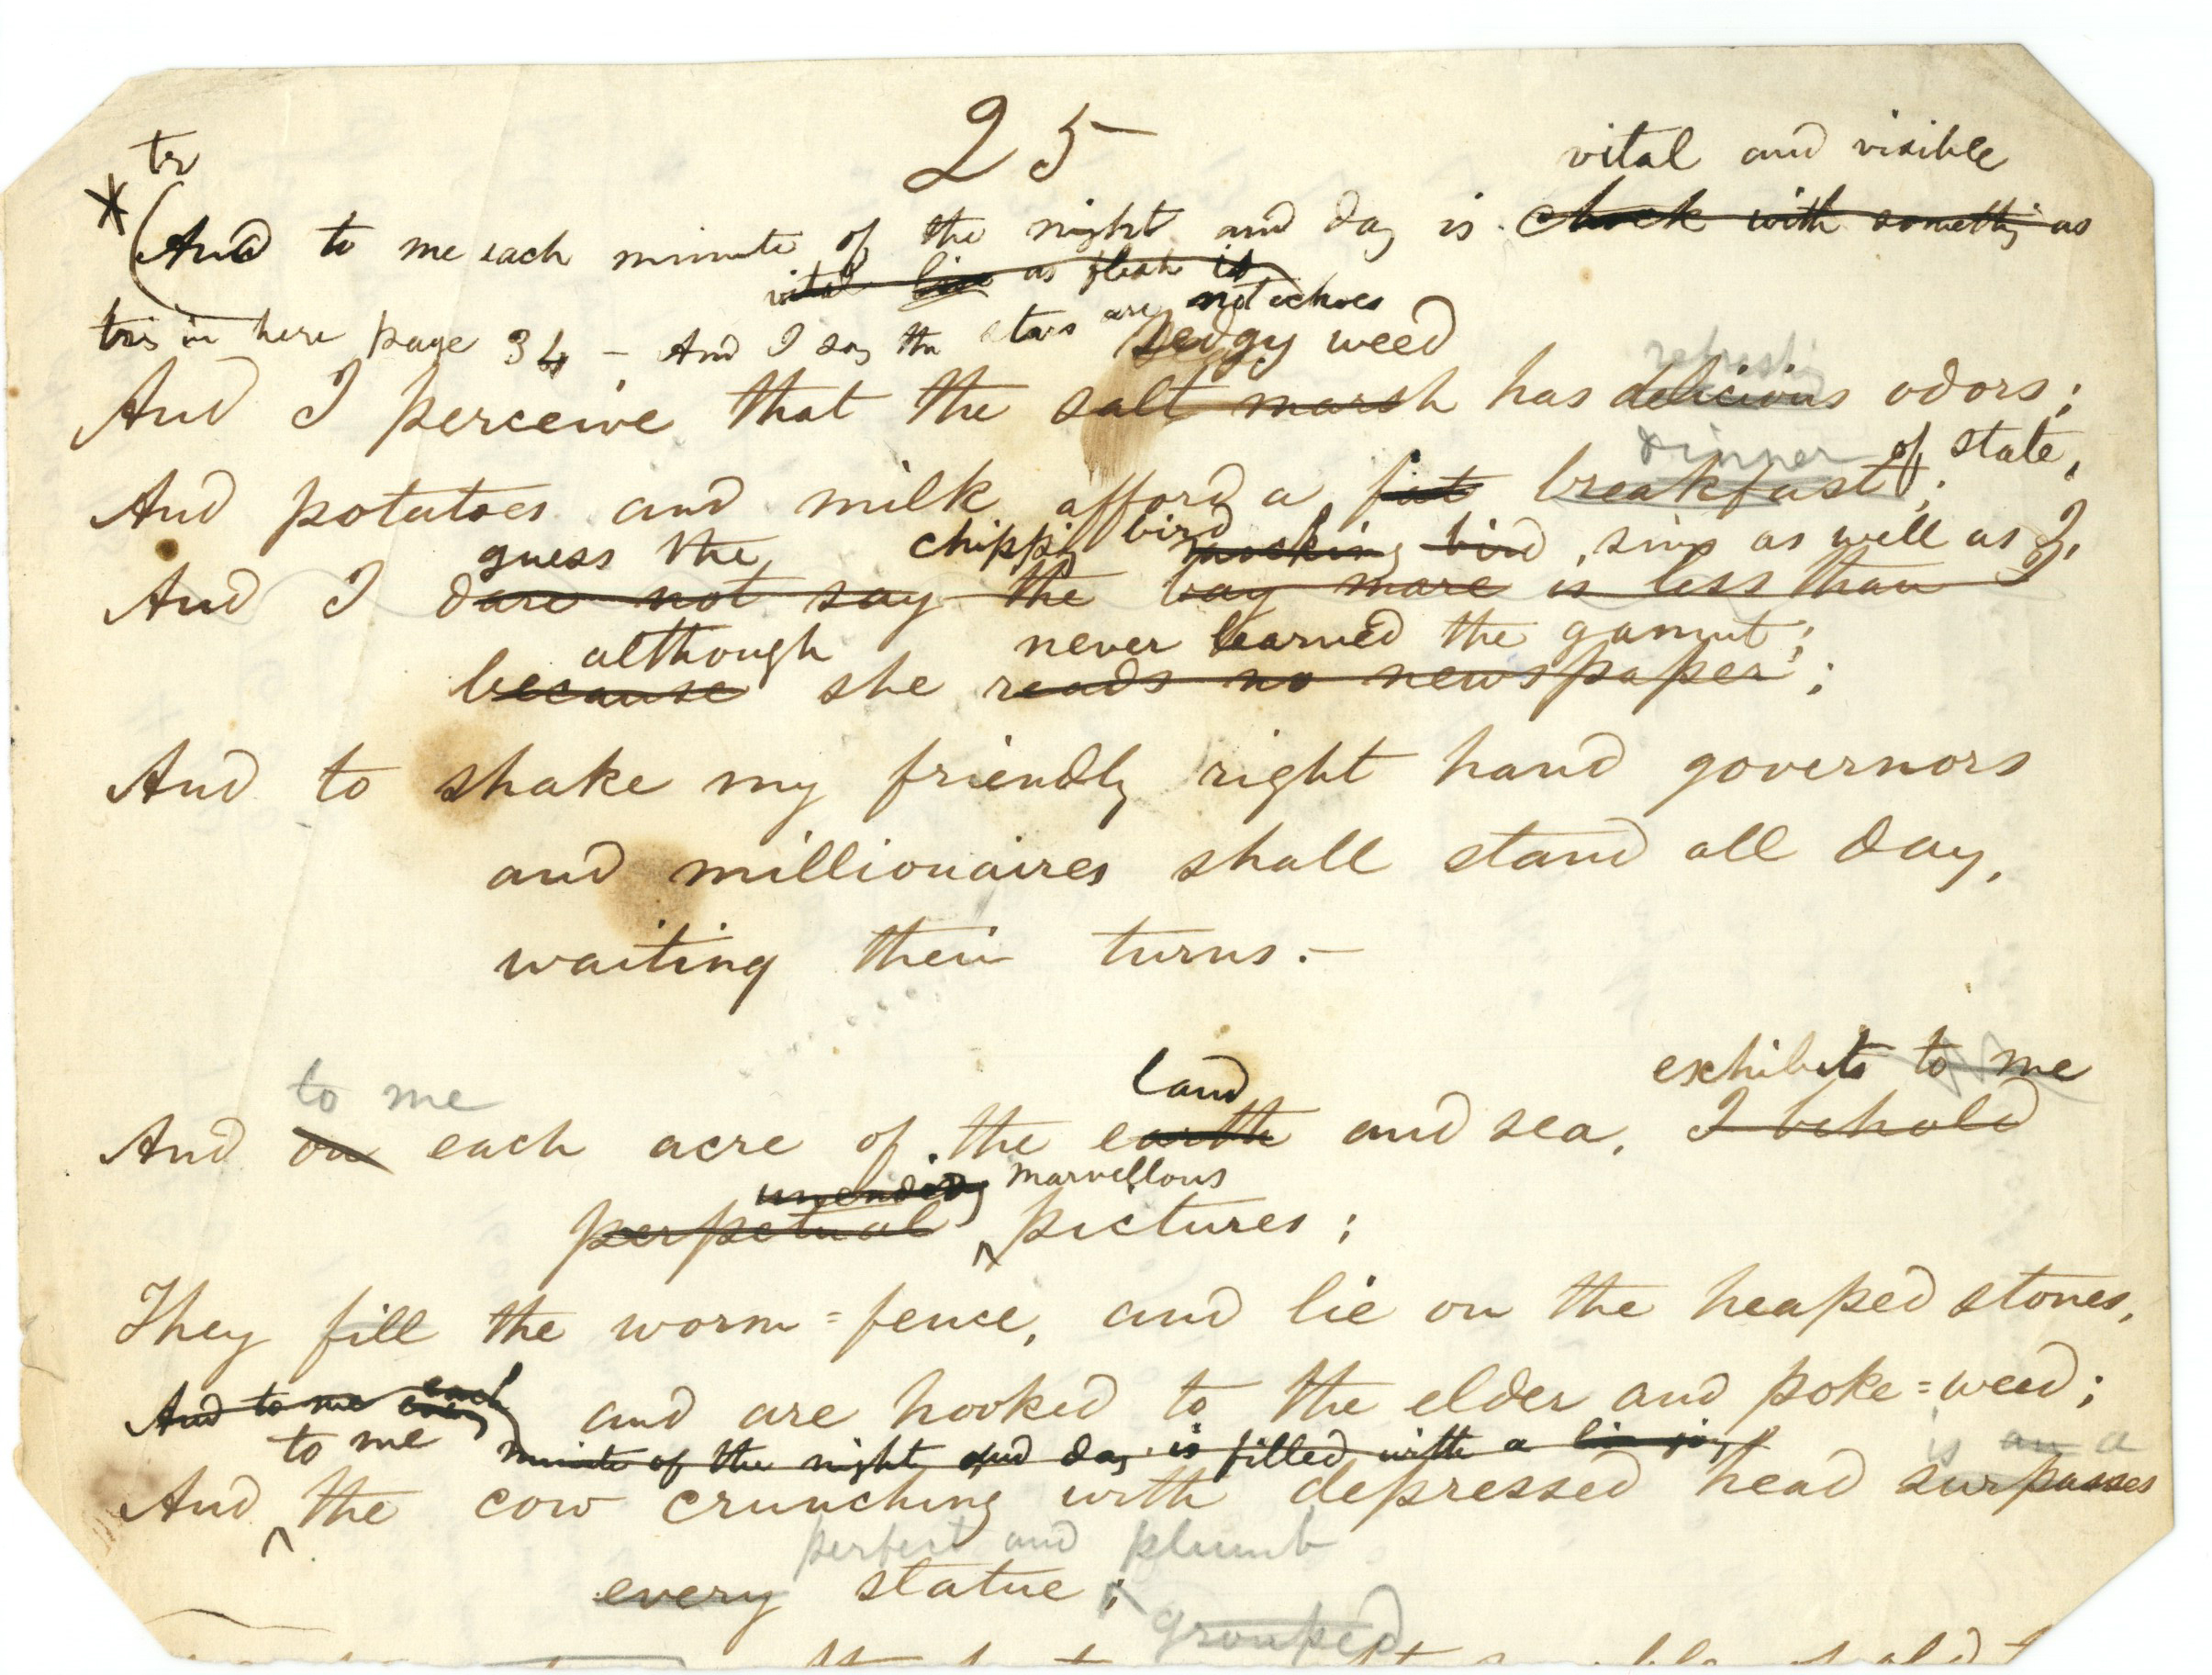 Origins: Manuscript Page (proto- Song of Myself)